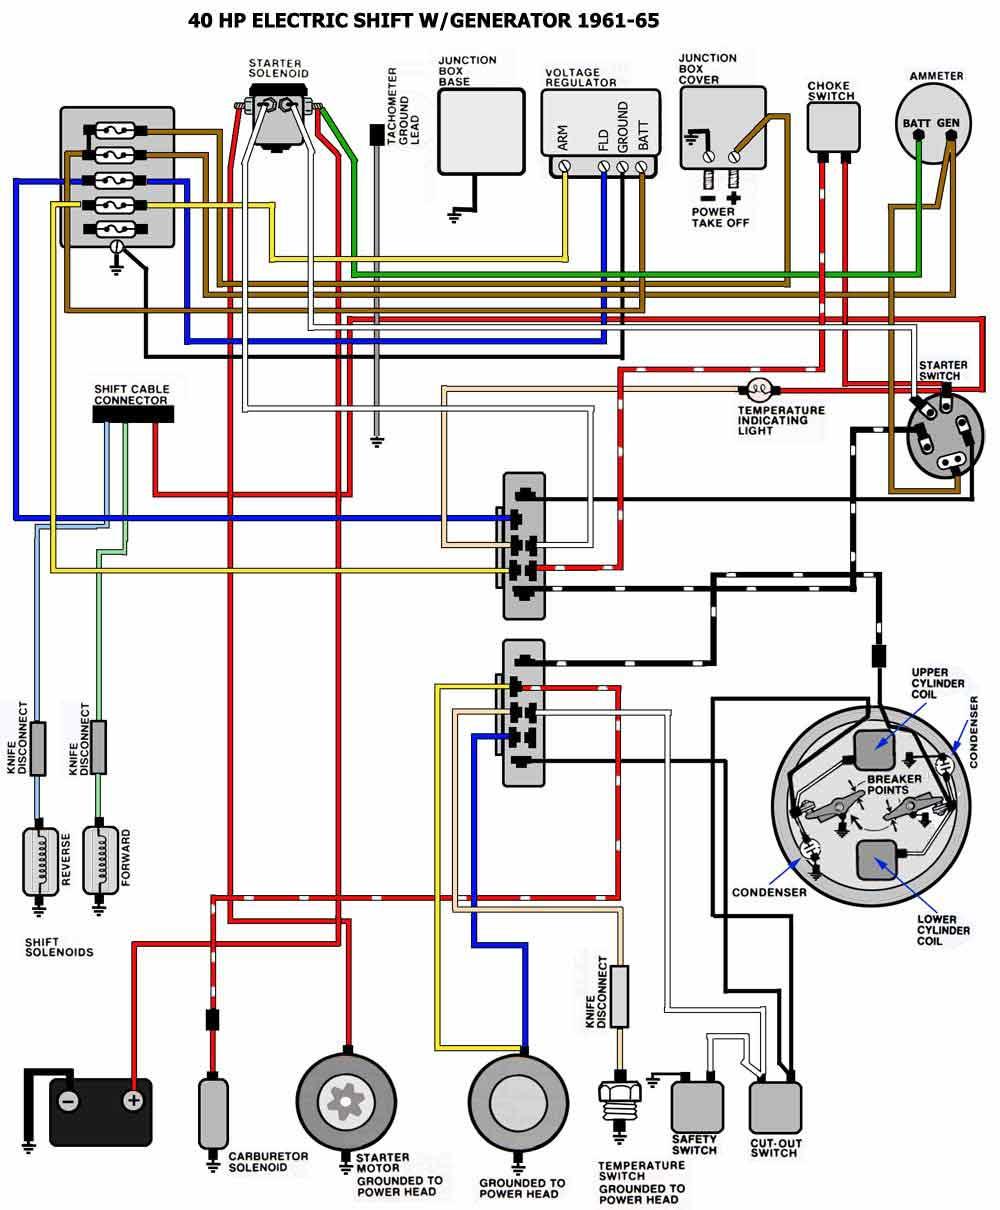 30 Hp Johnson Wiring Diagram - Wiring Diagrams Show Sabre Sailboat Wiring Diagram on